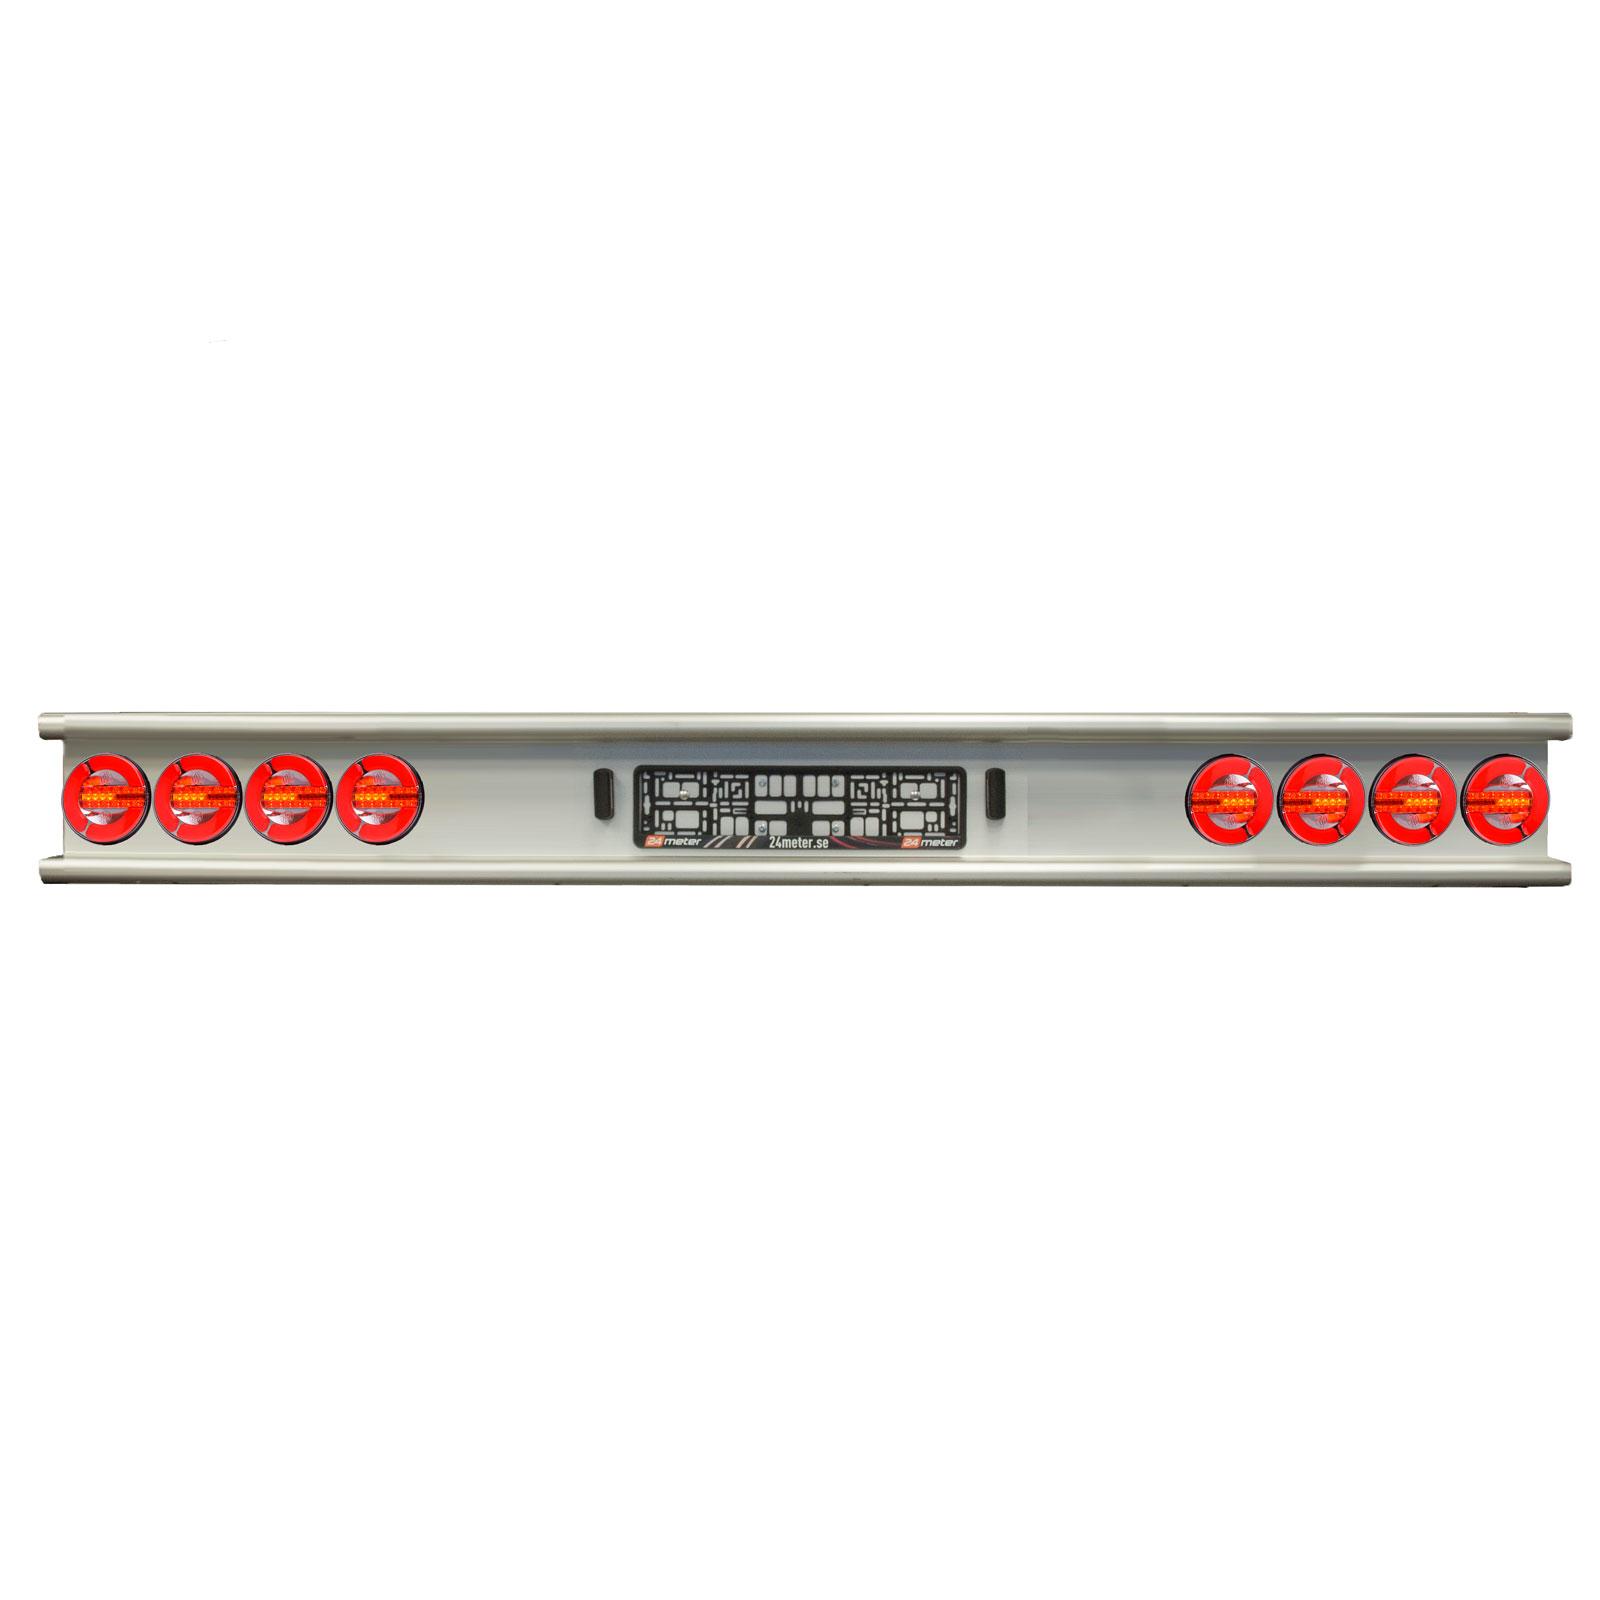 iLectric Bakljusramp Quattro W153 Dynamic